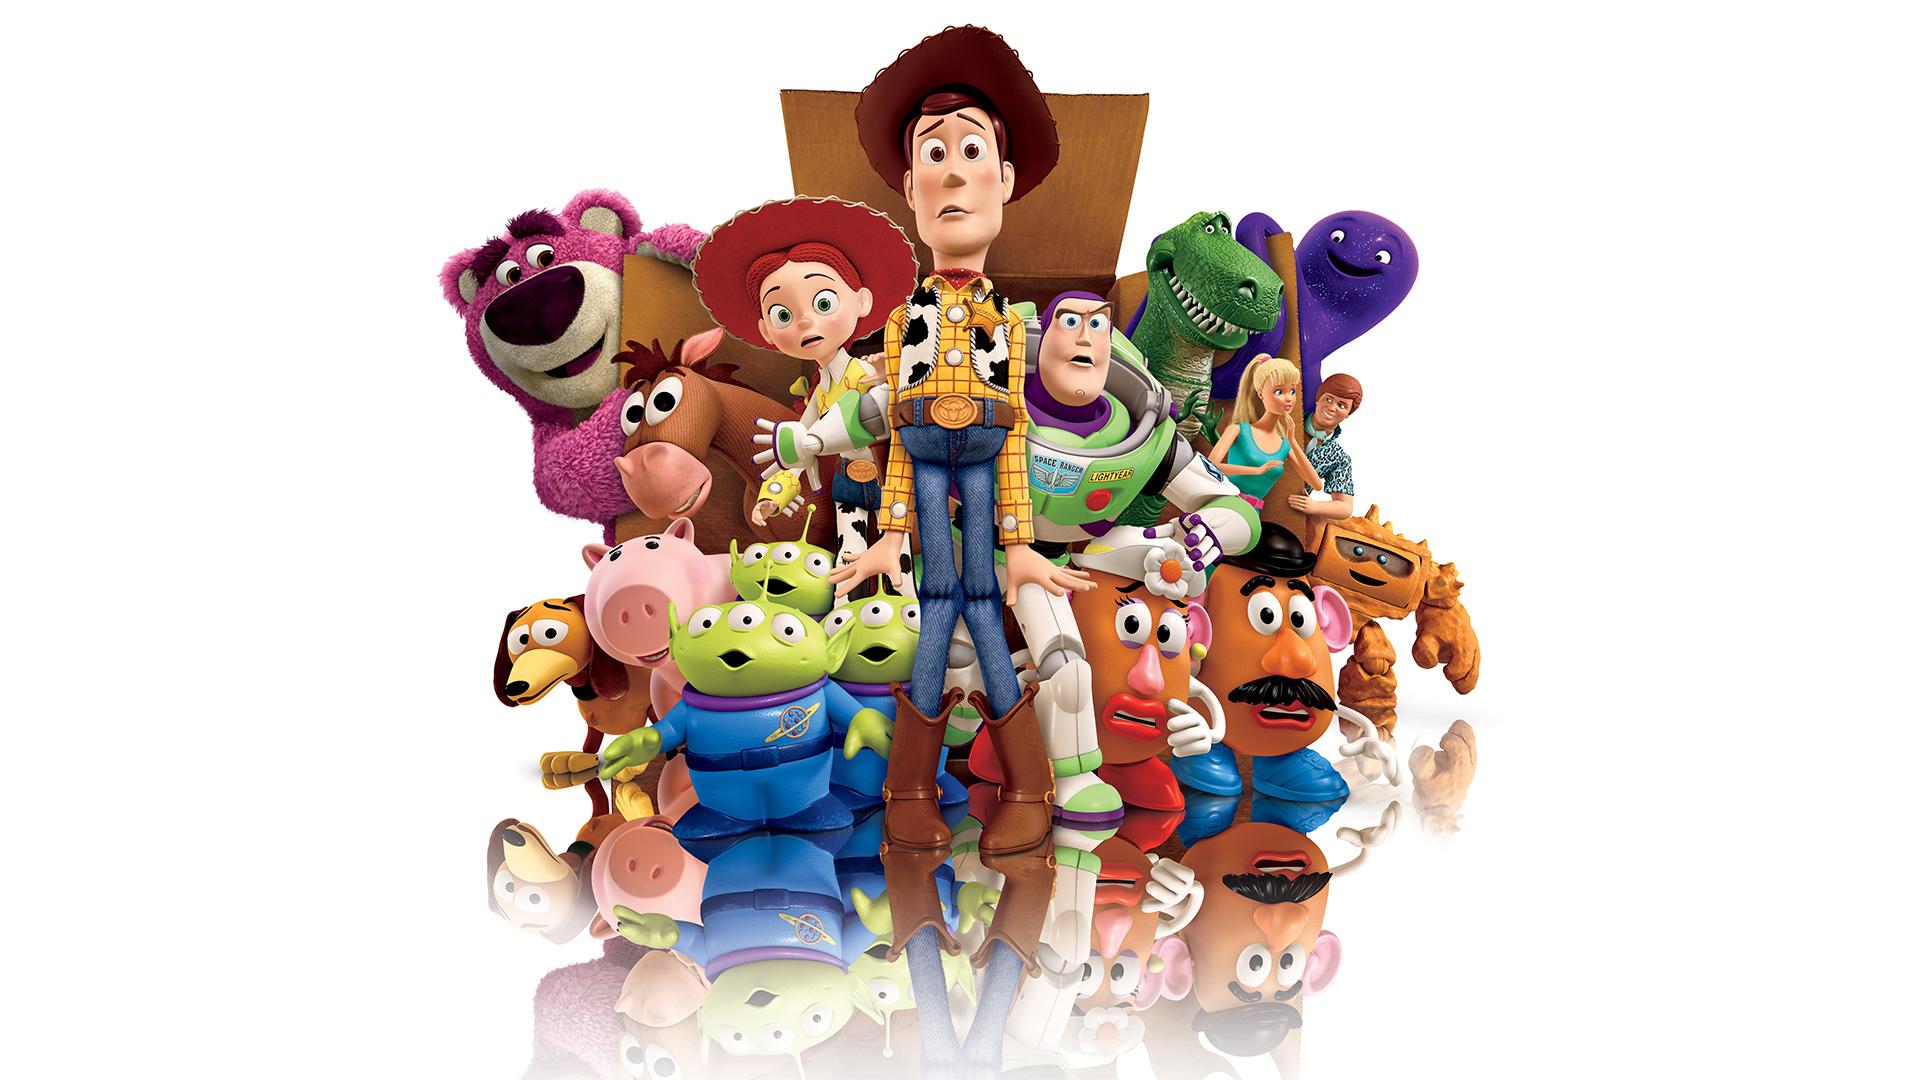 Toy Story 3 Toys : Toy story movie fanart tv